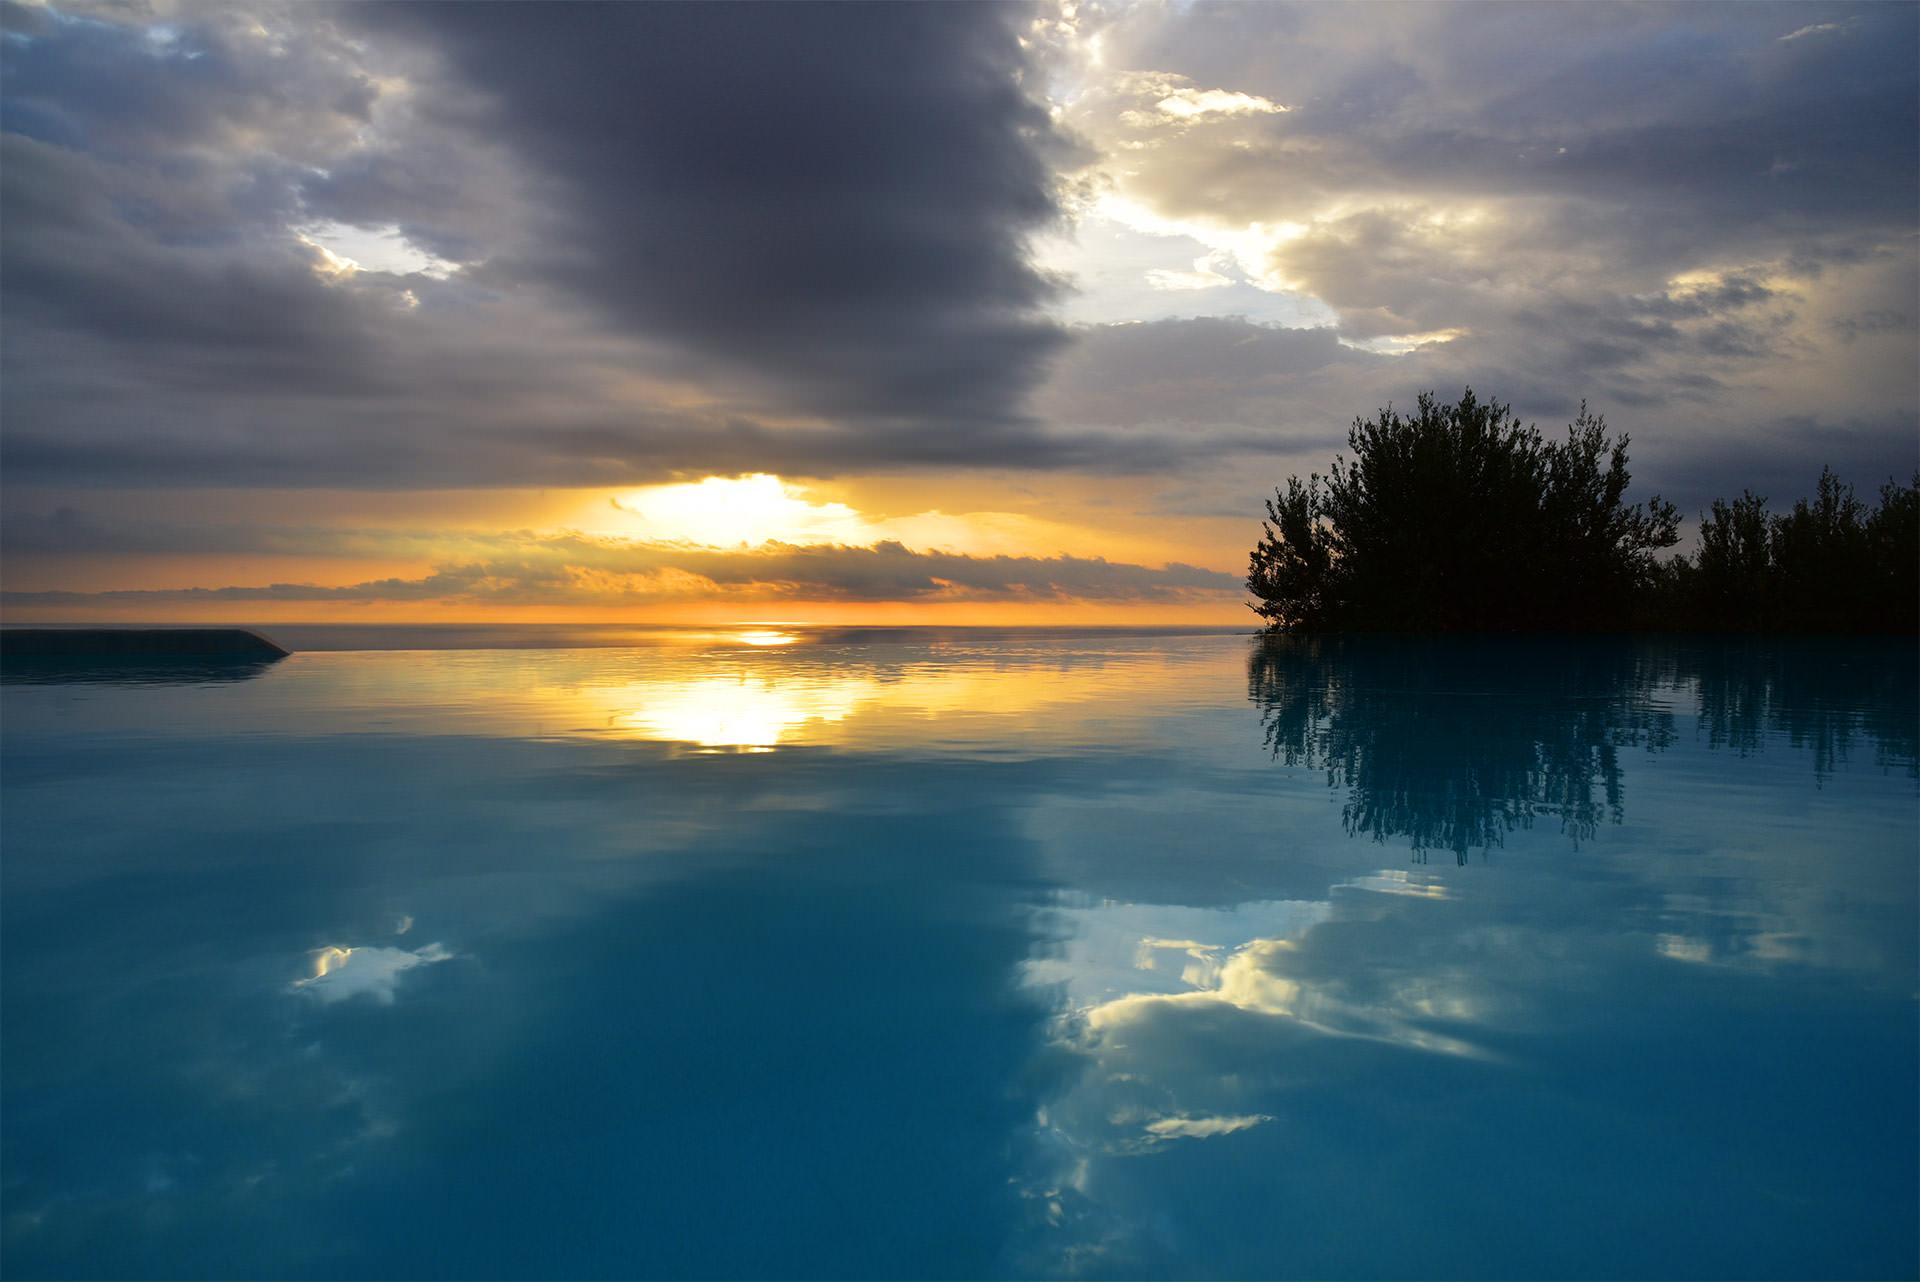 George Lizardos | Blue Bound | Kythira